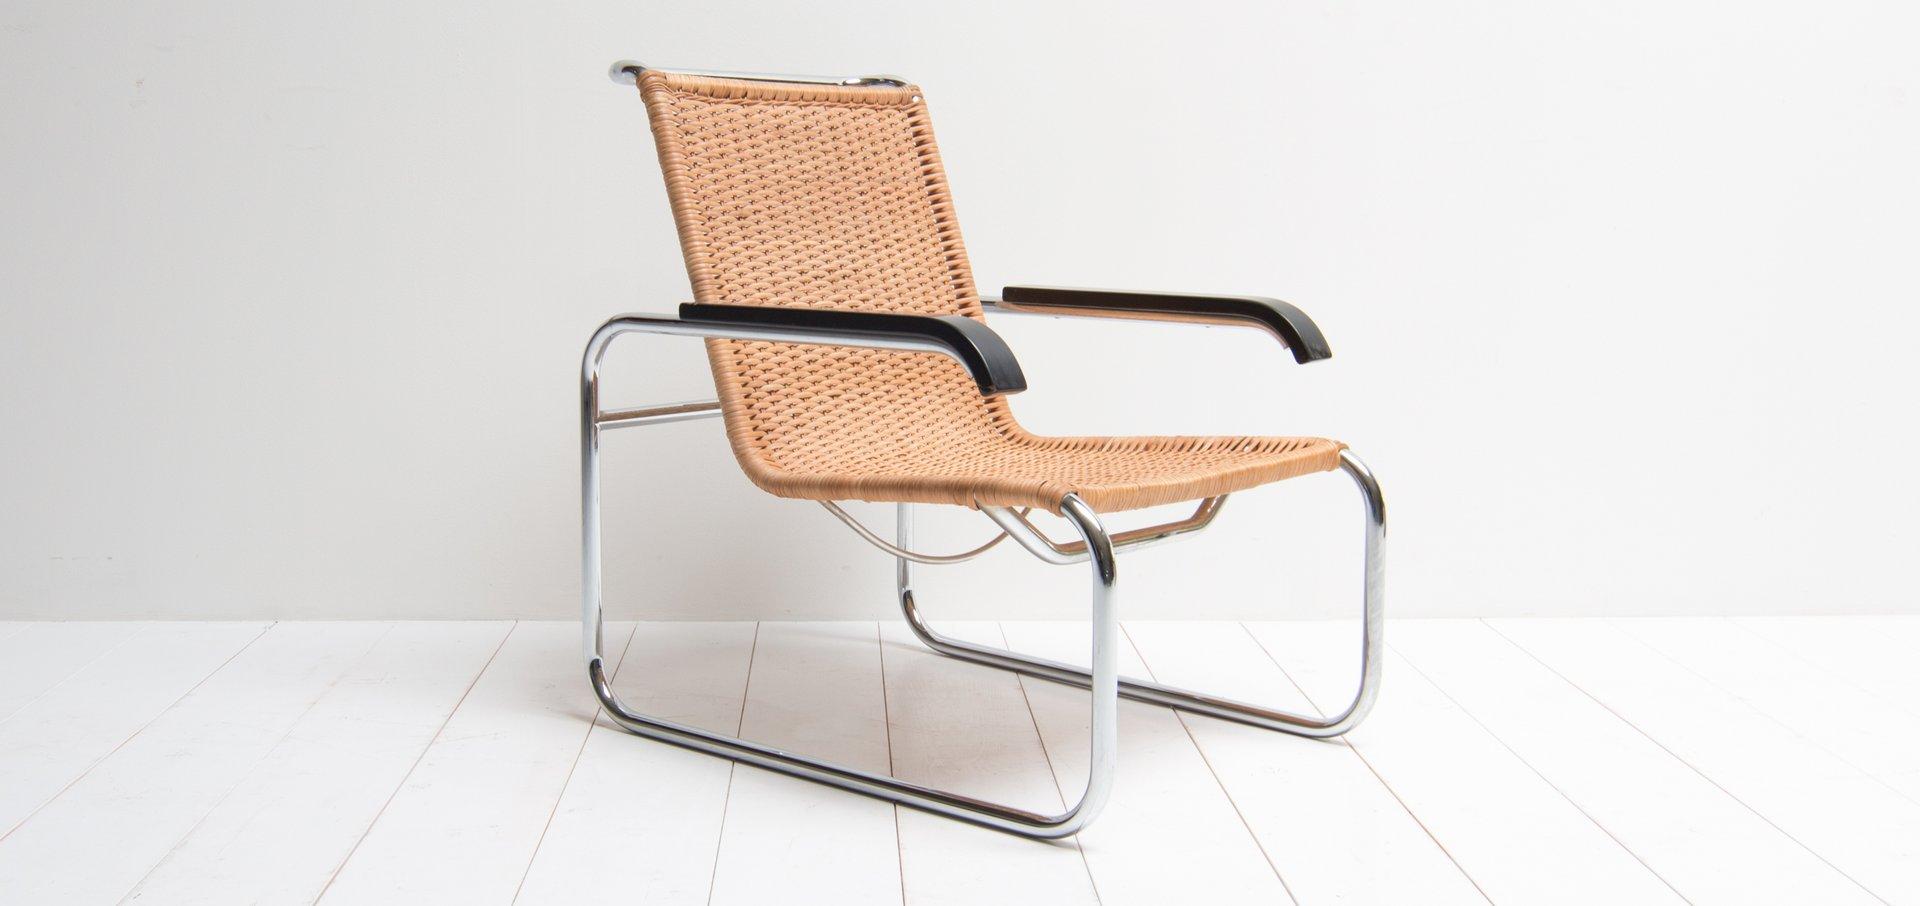 vintage modell b35 sessel von marcel breuer f r thonet bei pamono kaufen. Black Bedroom Furniture Sets. Home Design Ideas